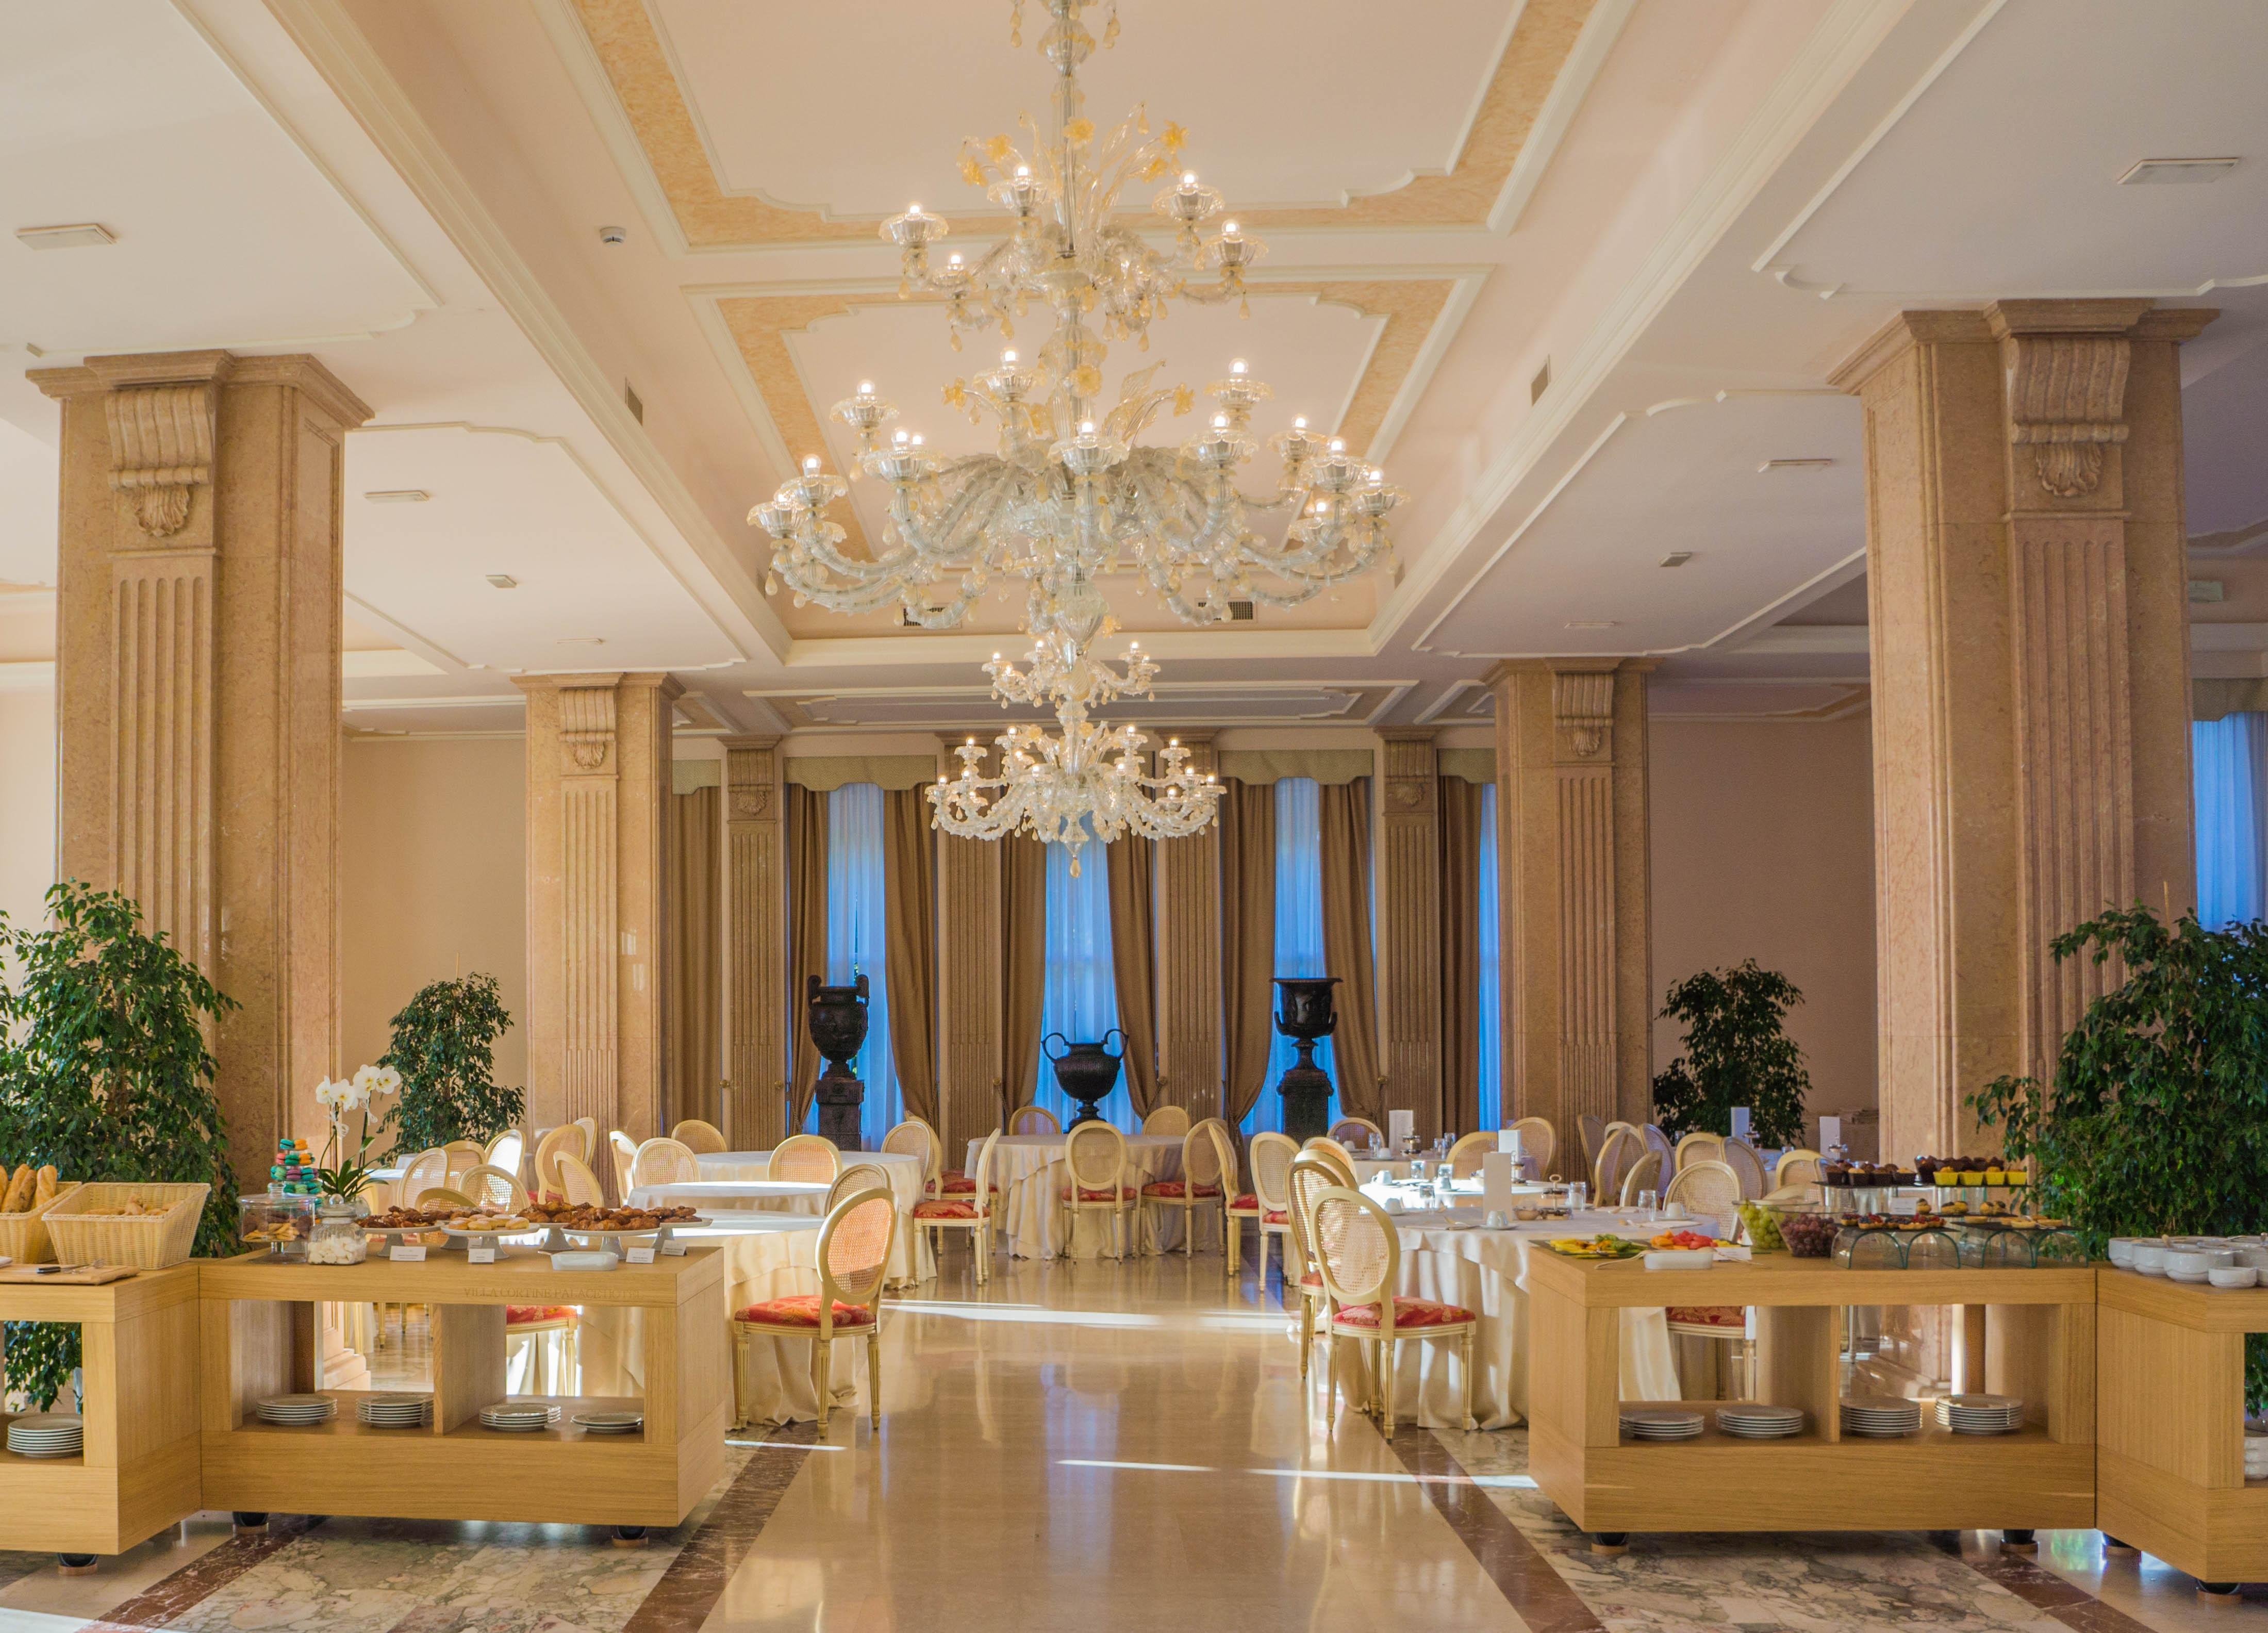 Fotoğraf Mimari Konak Restoran Saray Ev Tavan